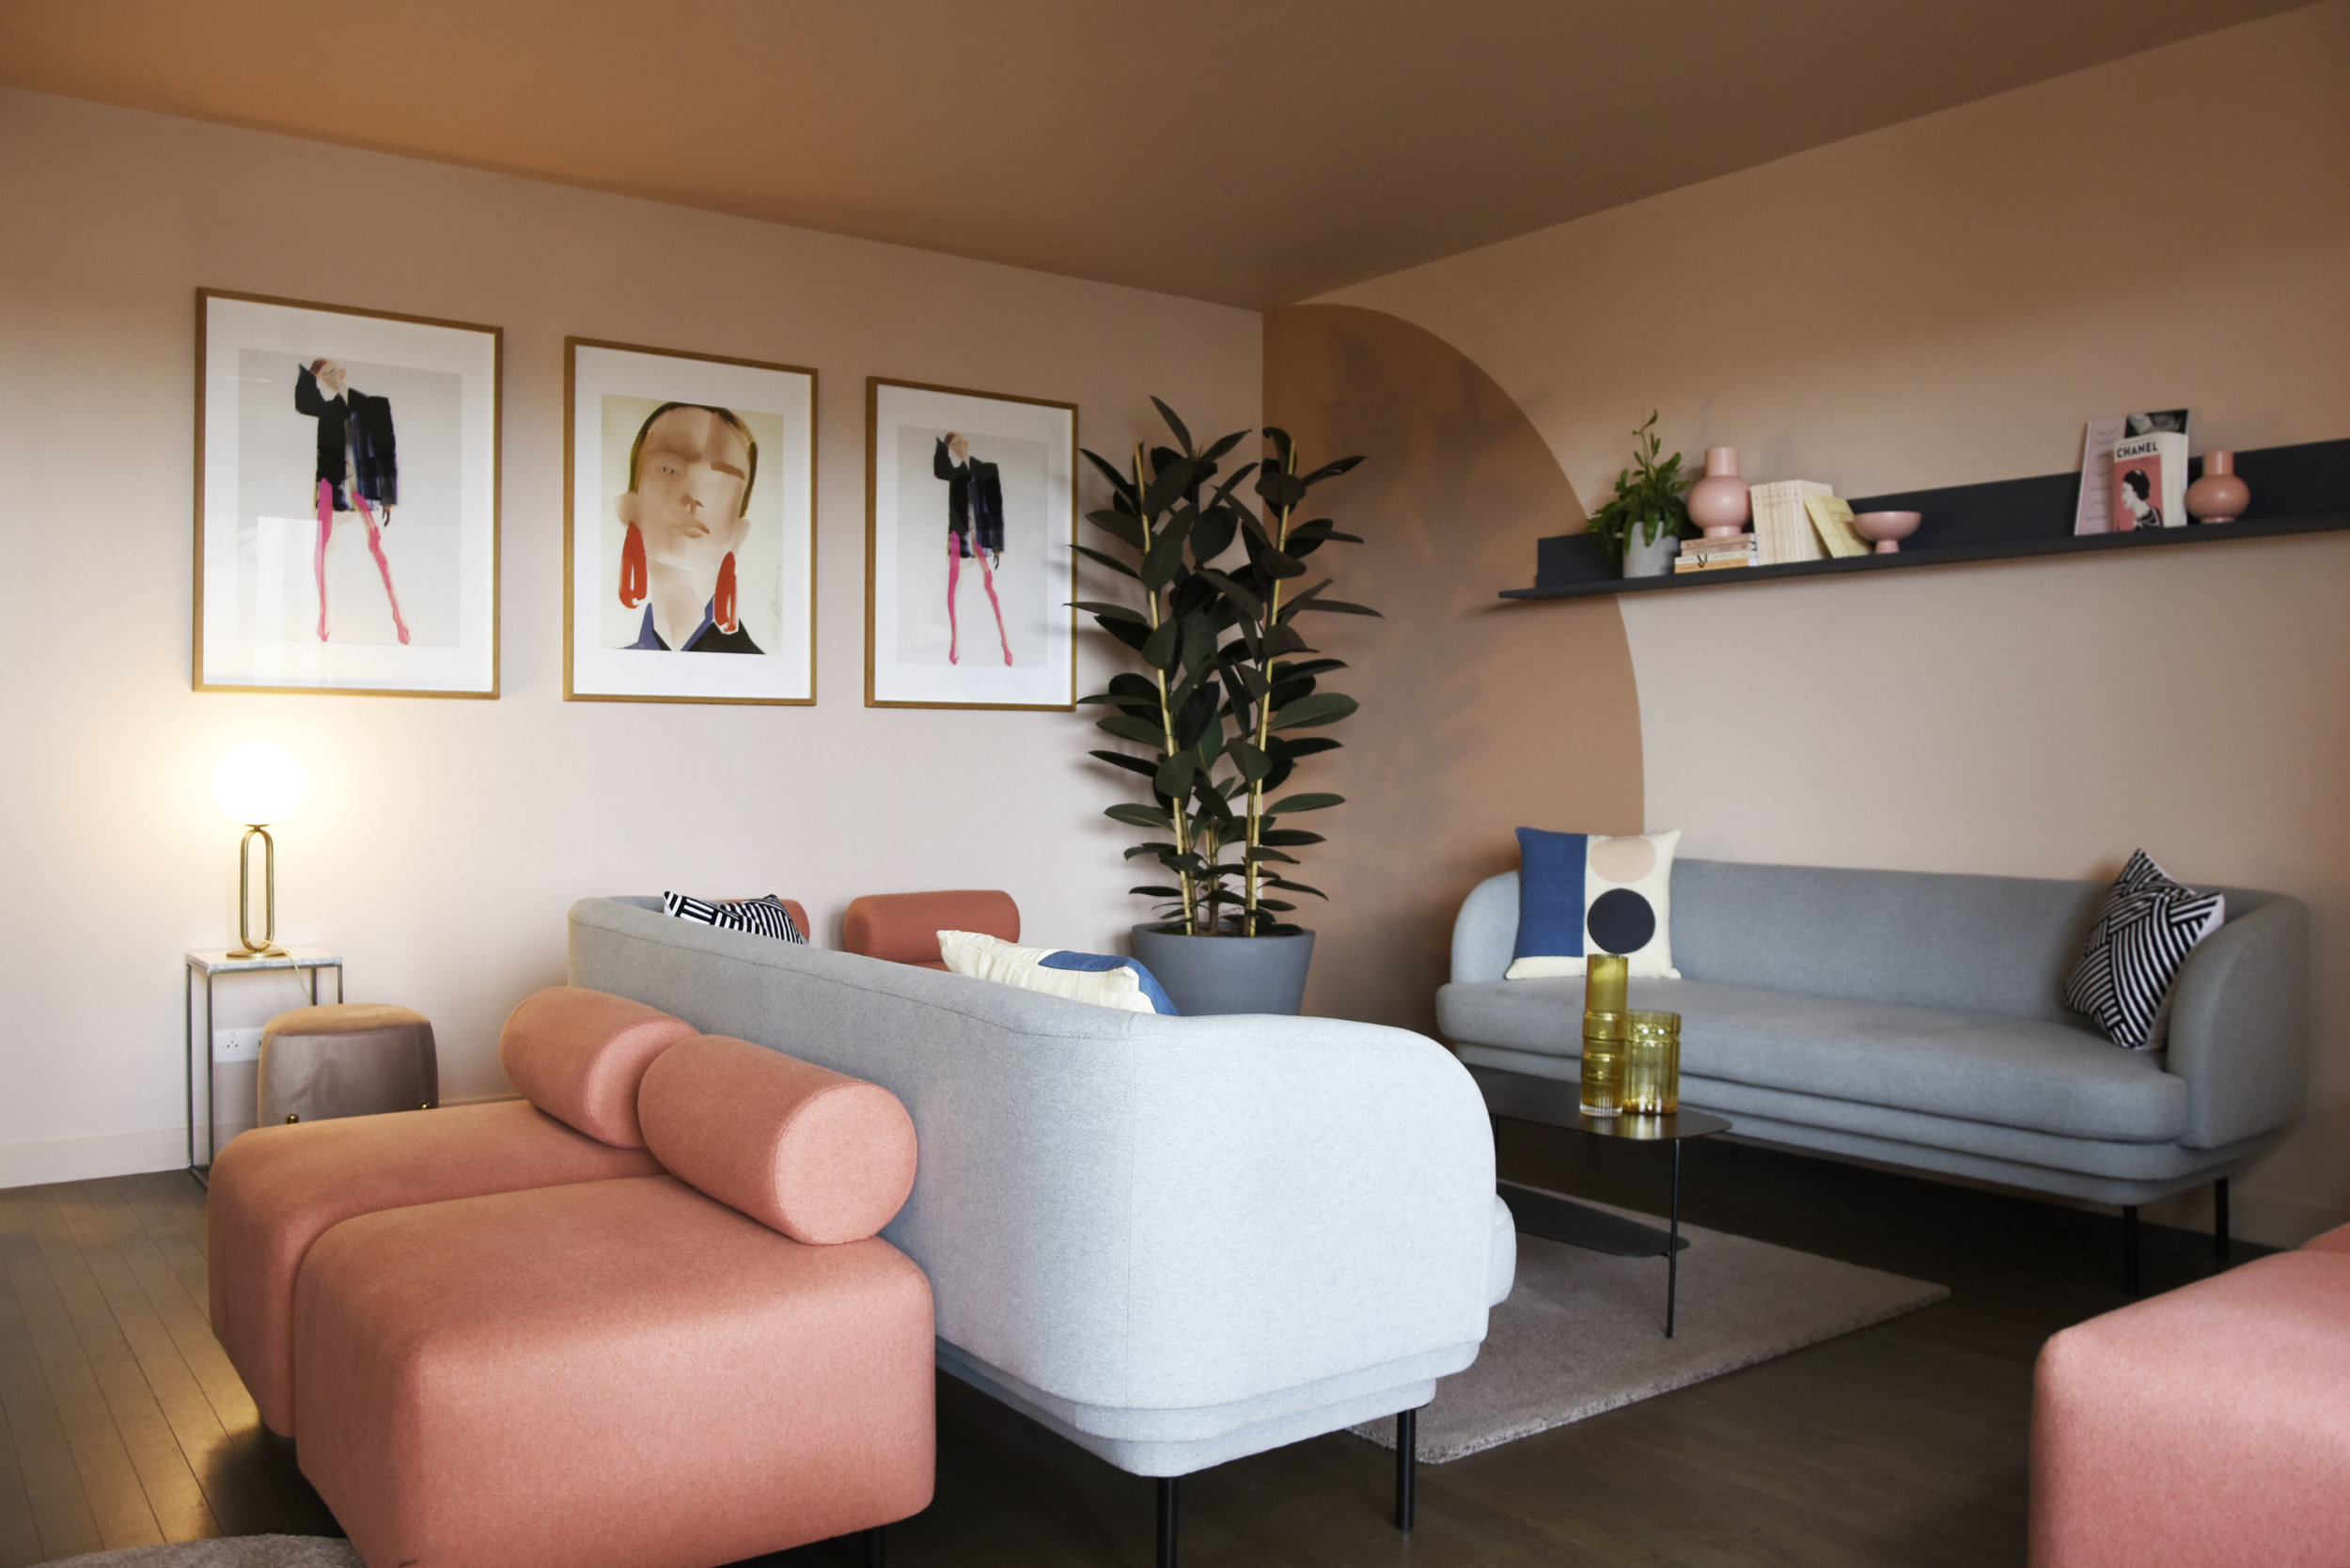 GALERIE LAFAYETTE espace client premium / BOVARI pouf, CORNICE sofa, CIME lamp, ONDIN vase